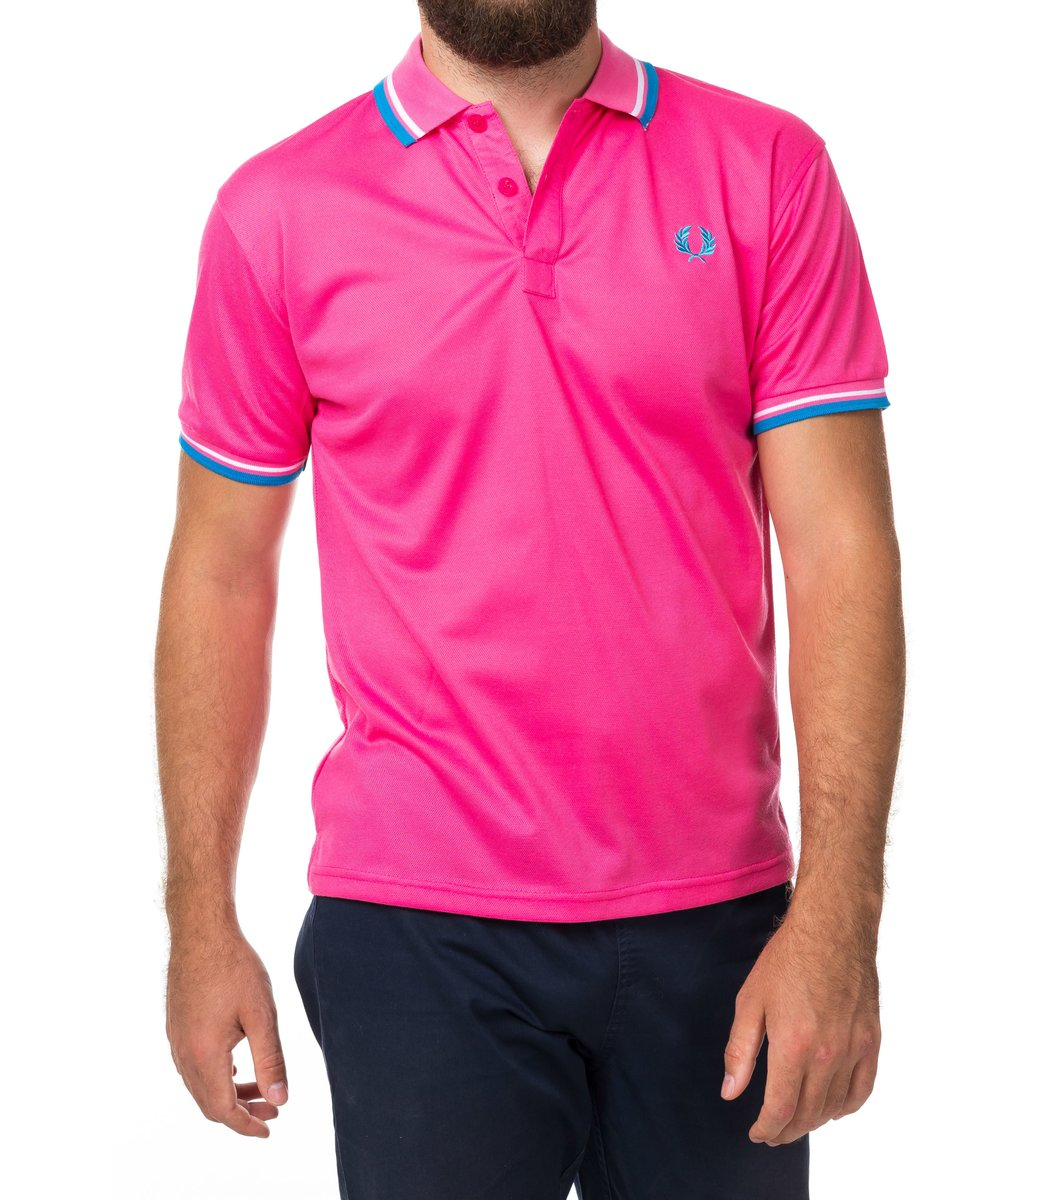 Мужская темно-розовая футболка поло Fred Perry - темно-розовый - Вид 2